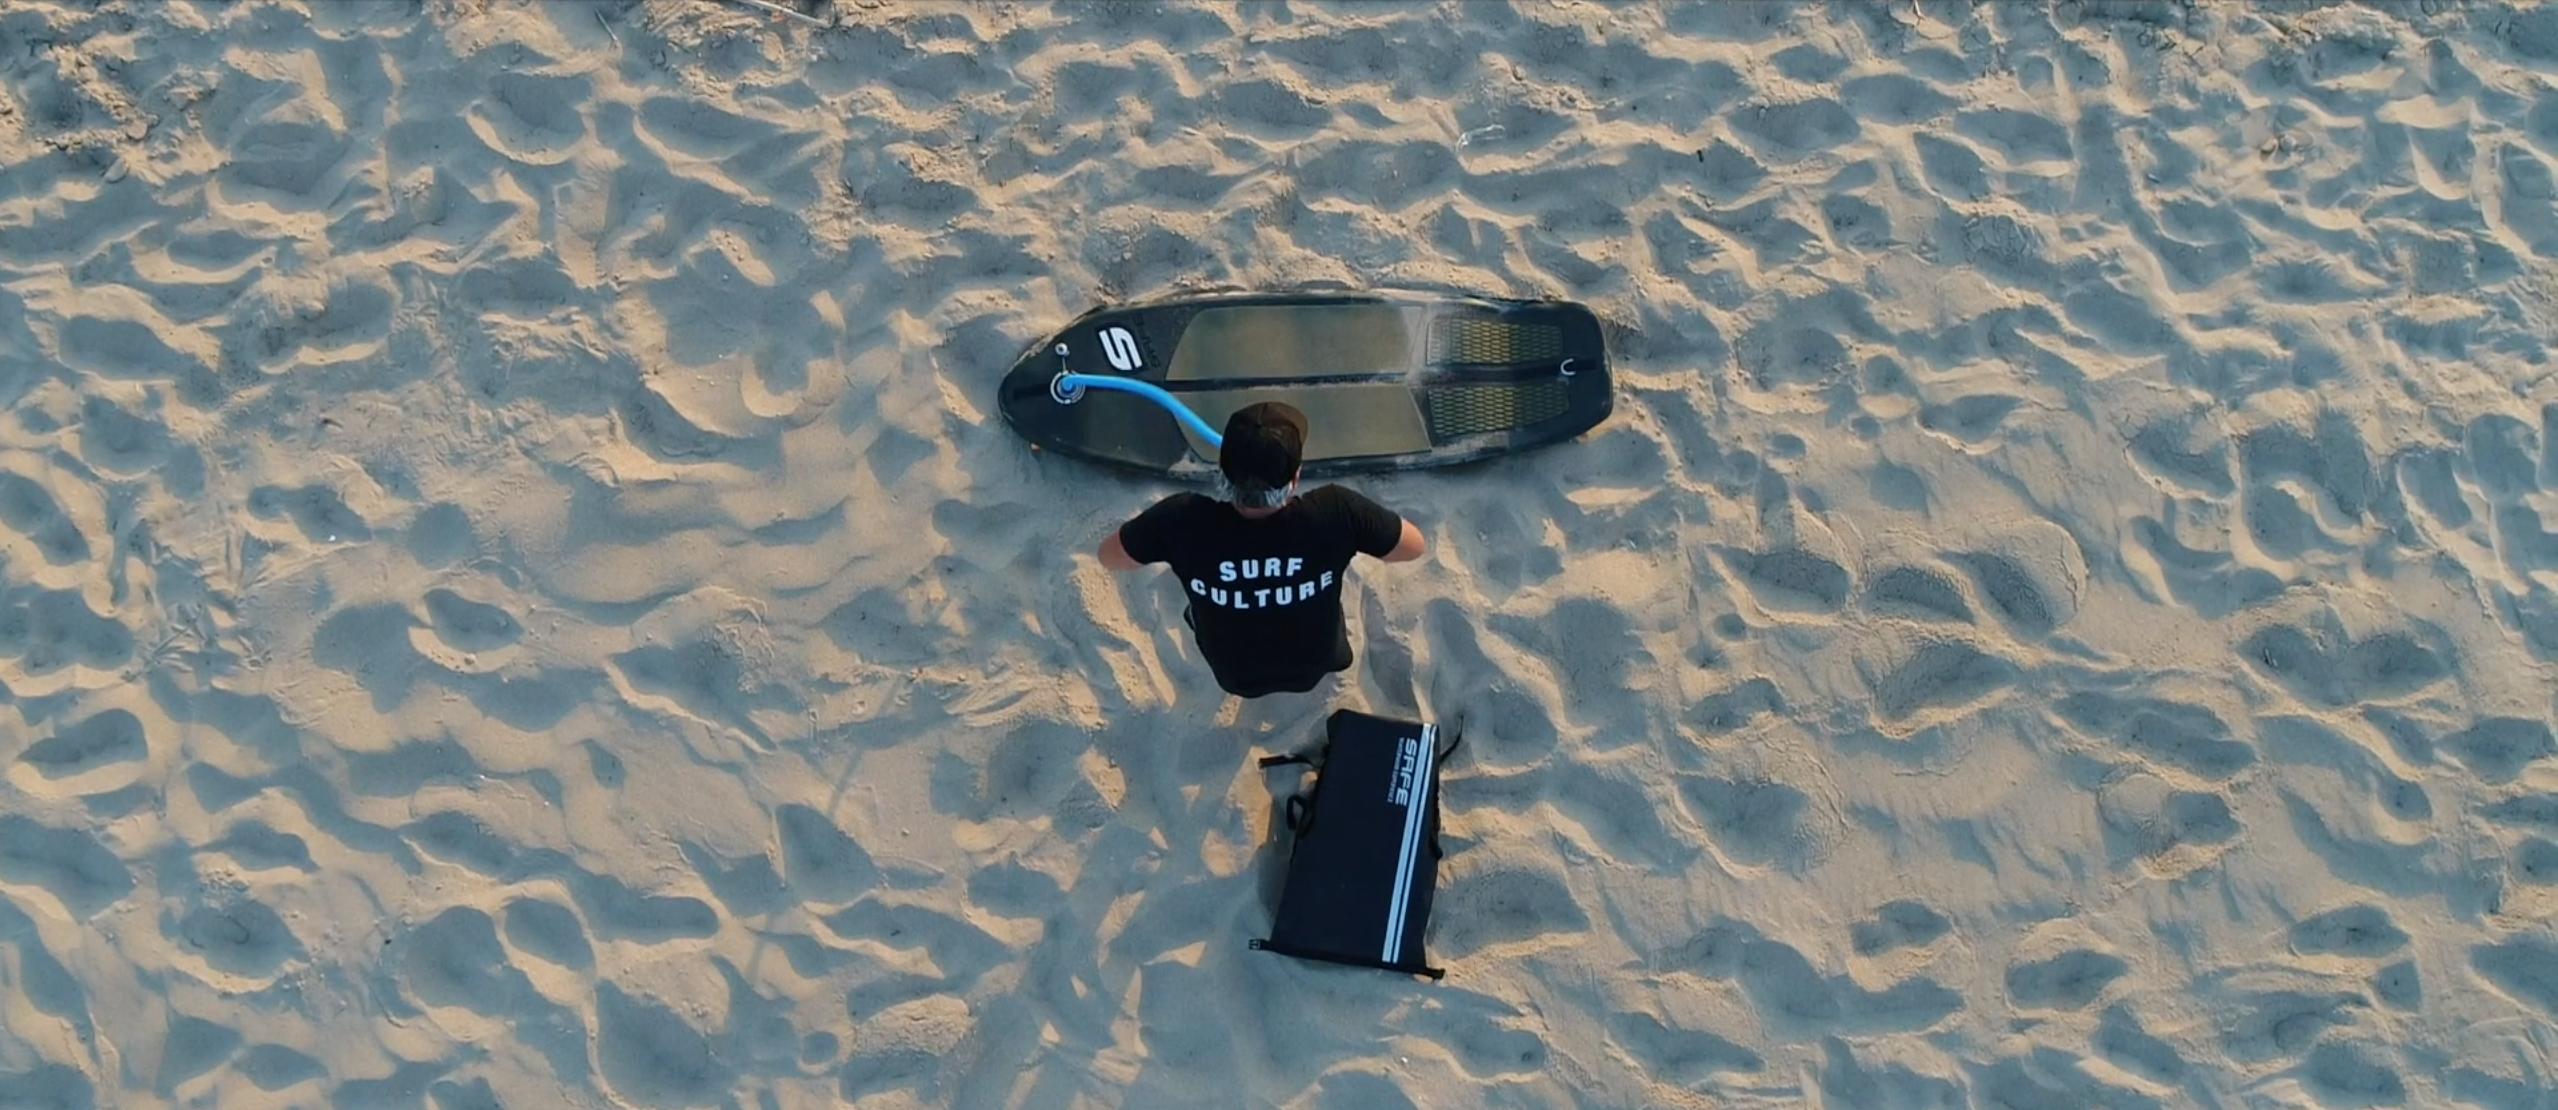 surf-air-gonfiabile-nicola-bresciani